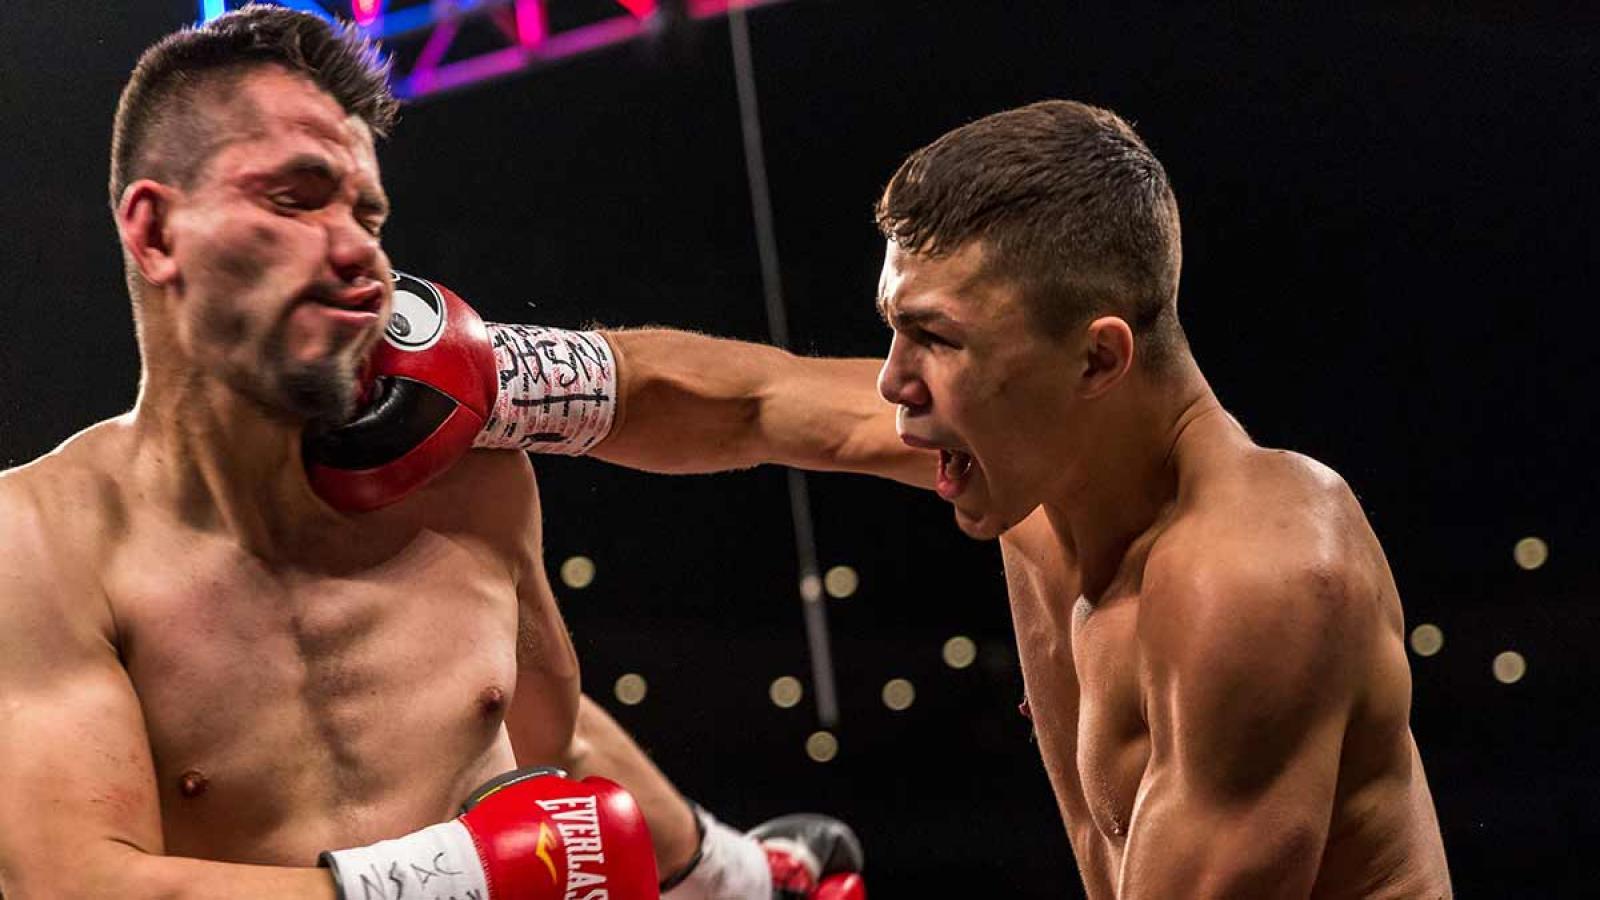 Joey Spencer - Next Fight, Fighter Bio, Stats & News